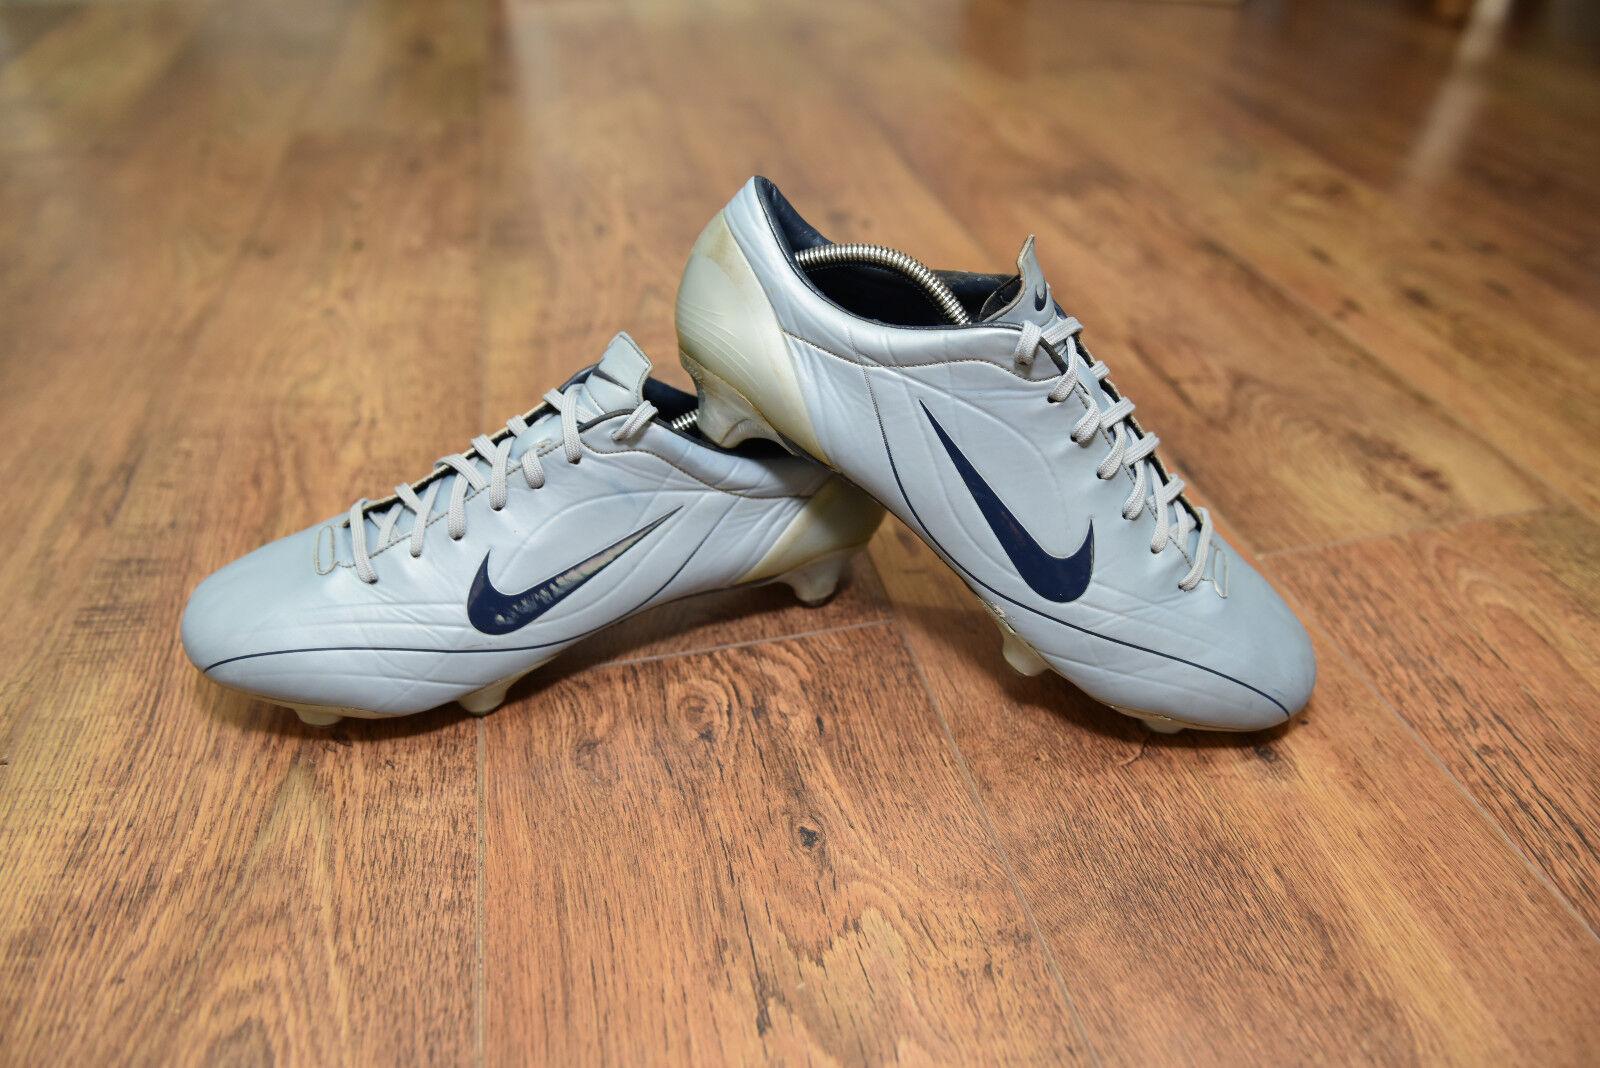 Nike Mercurial Vapor Ii Sg Fútbol botas Talla Uk 12 Vapor R9 Top Spec